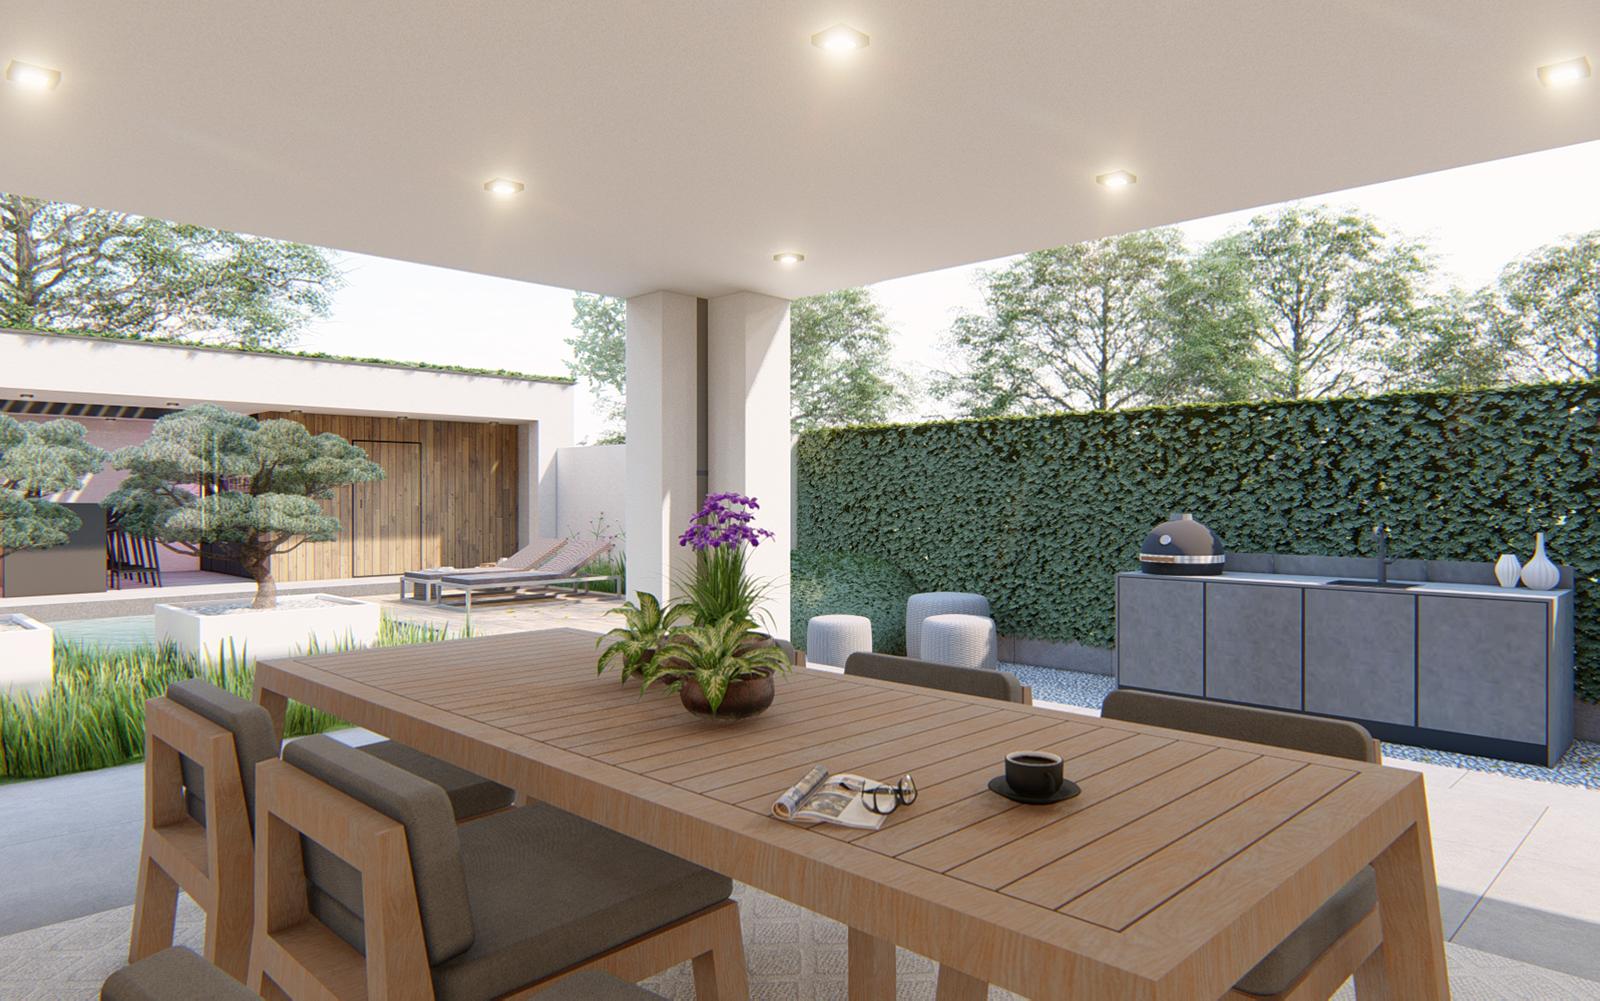 Knops Tuindesign, Villatuin, Exclusieve tuin, luxe, niveauverschillen